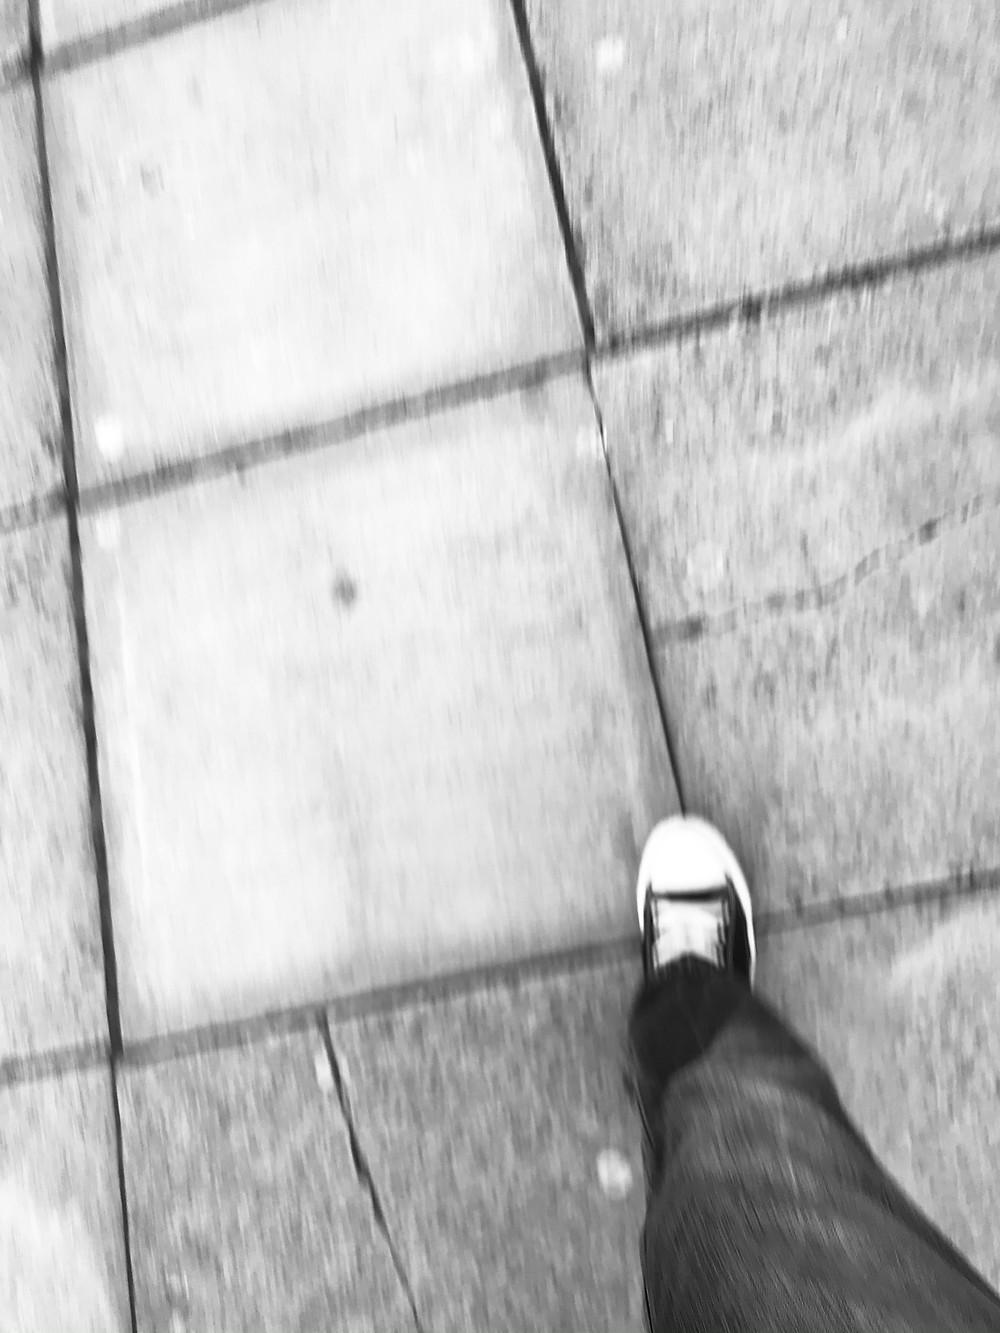 Mark Blezard talks about looking when you walk